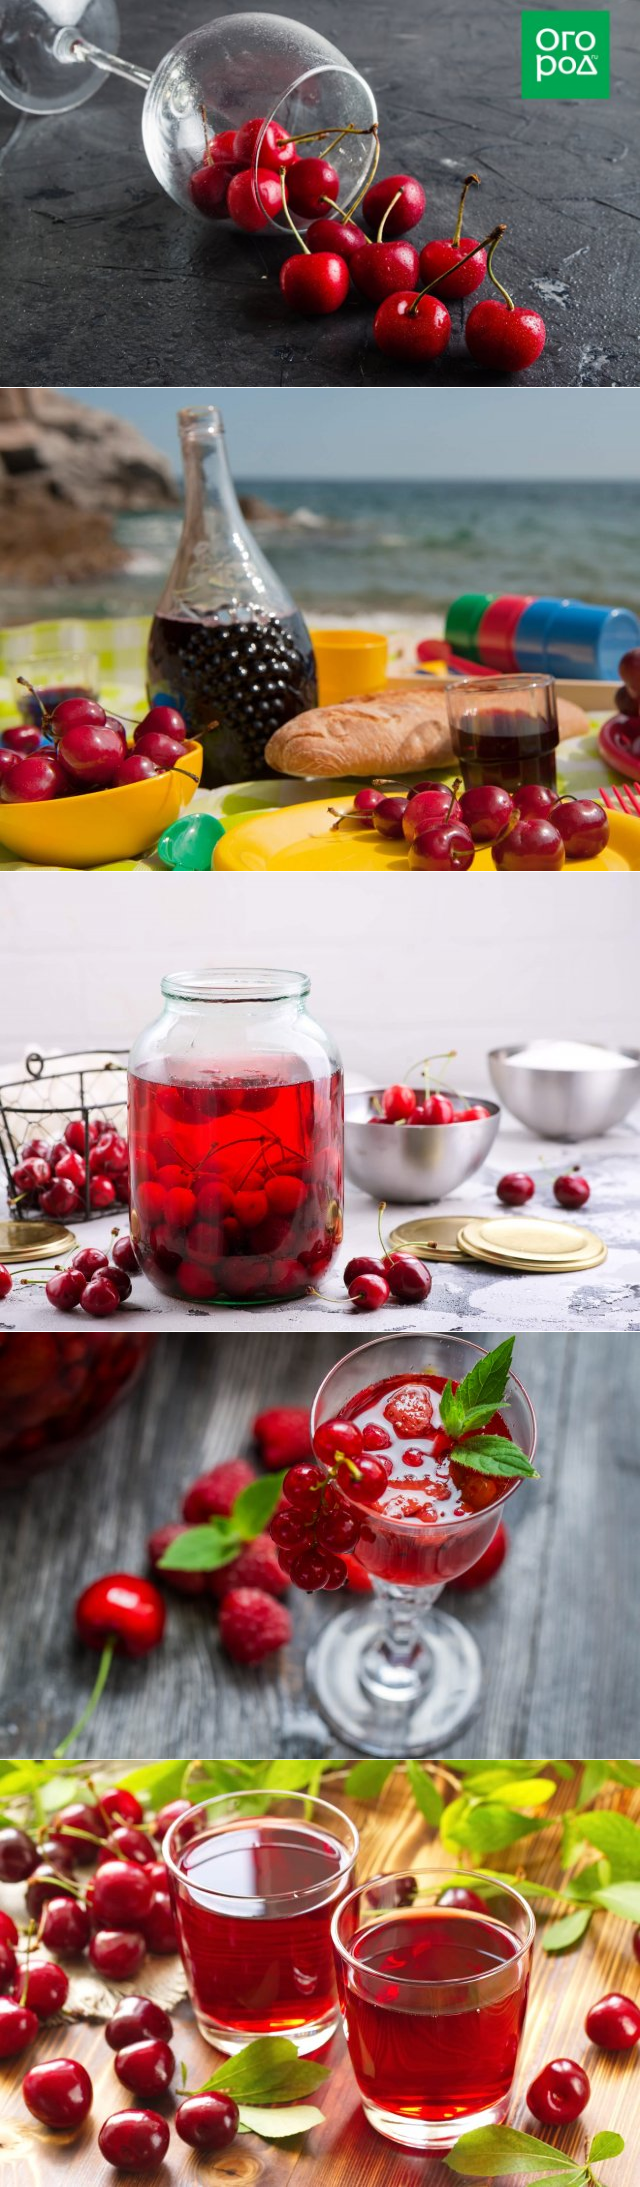 Рецепт вишневого ликера. рецепты ликеров из вишни. с привкусом лета на губах.